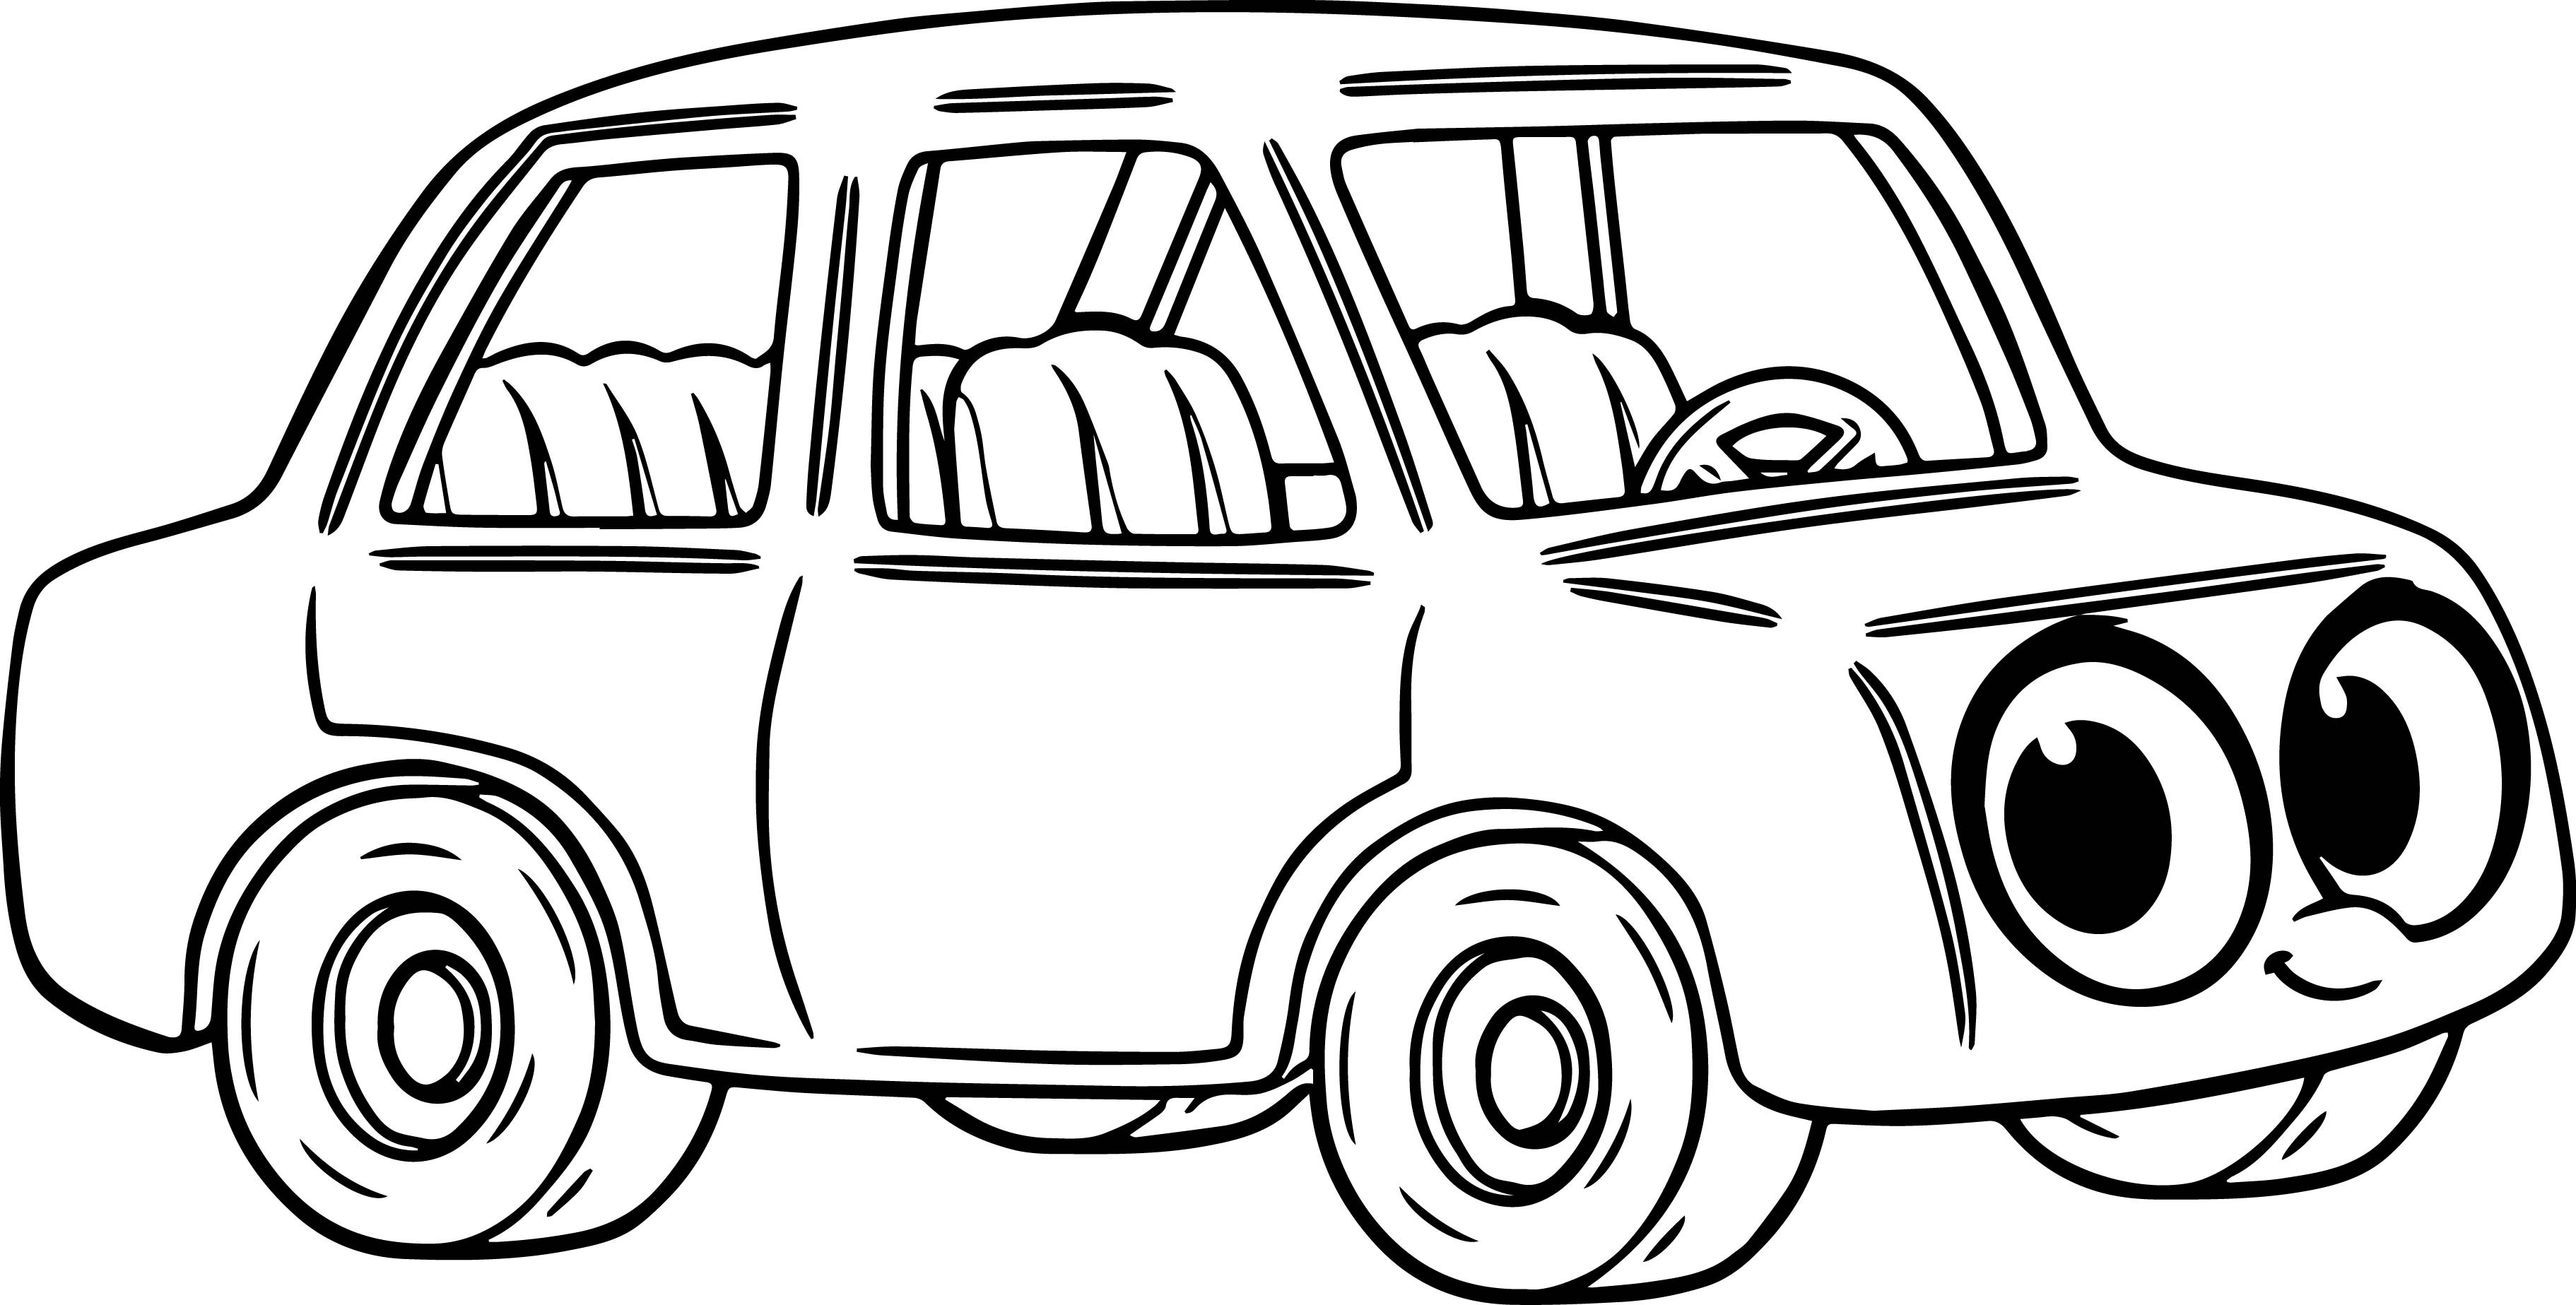 Car Cartoon Drawing At Getdrawings